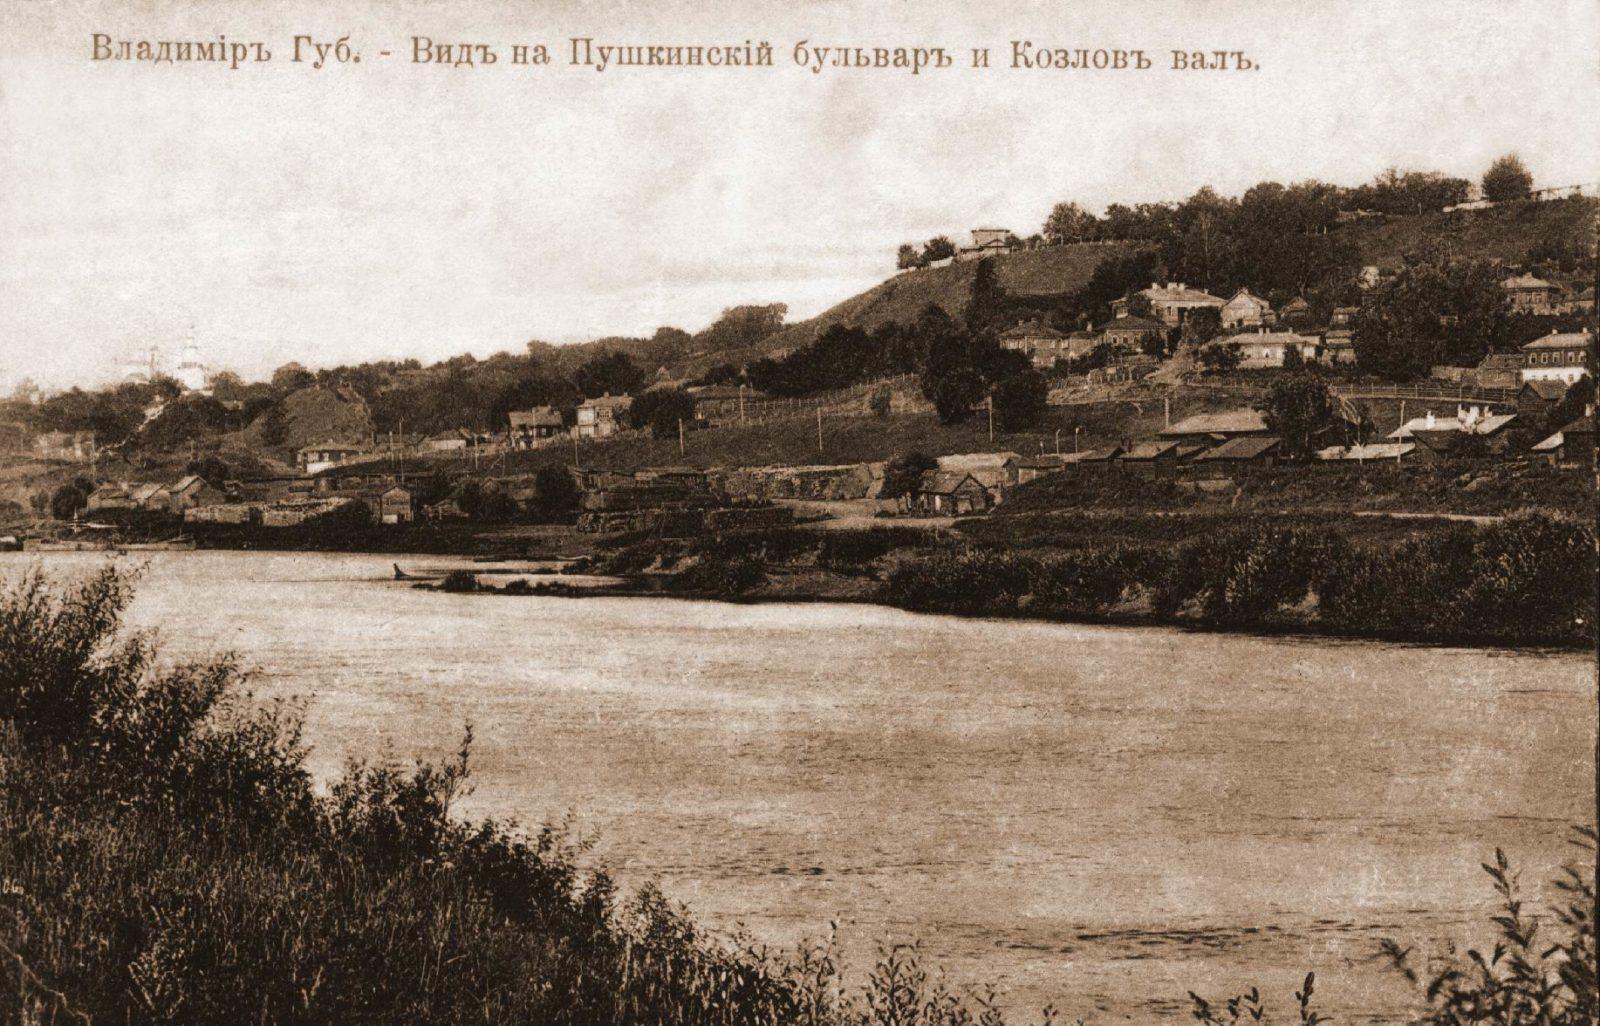 Vladimir, view from the Pushkin Boulevard and Kozlov Val.